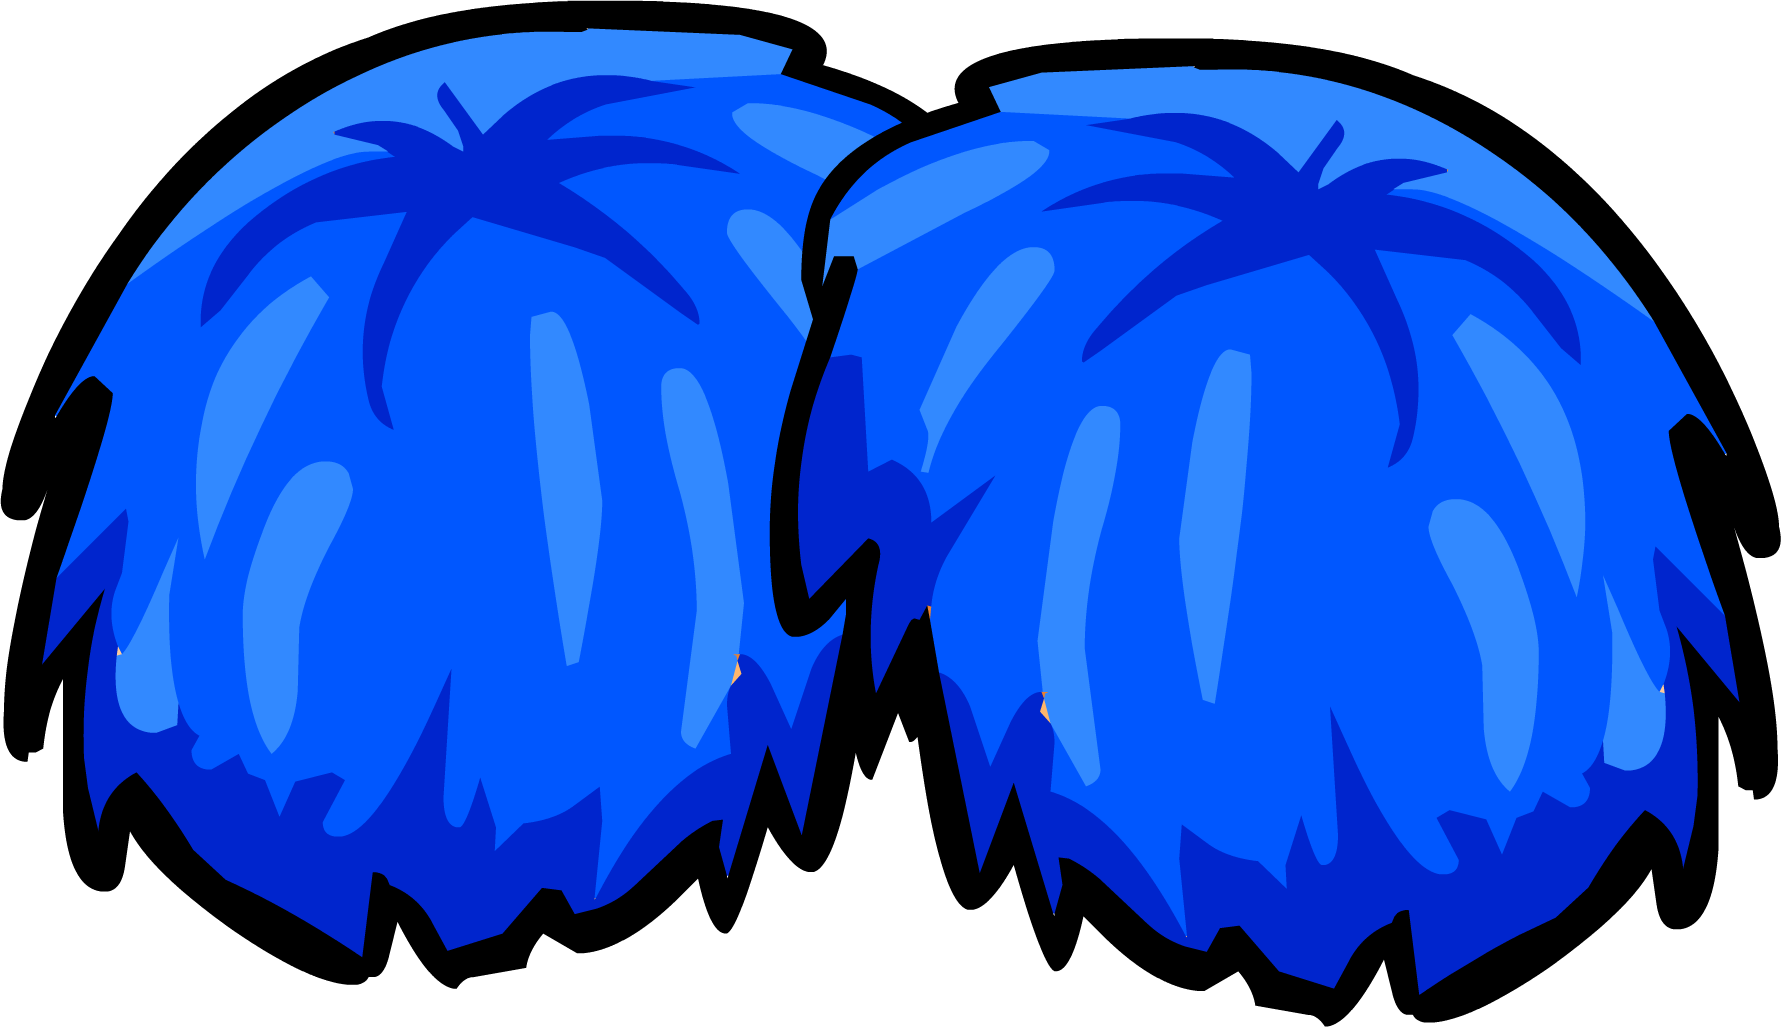 Club clipart pompom Free Cliparts Blue Clipart Art